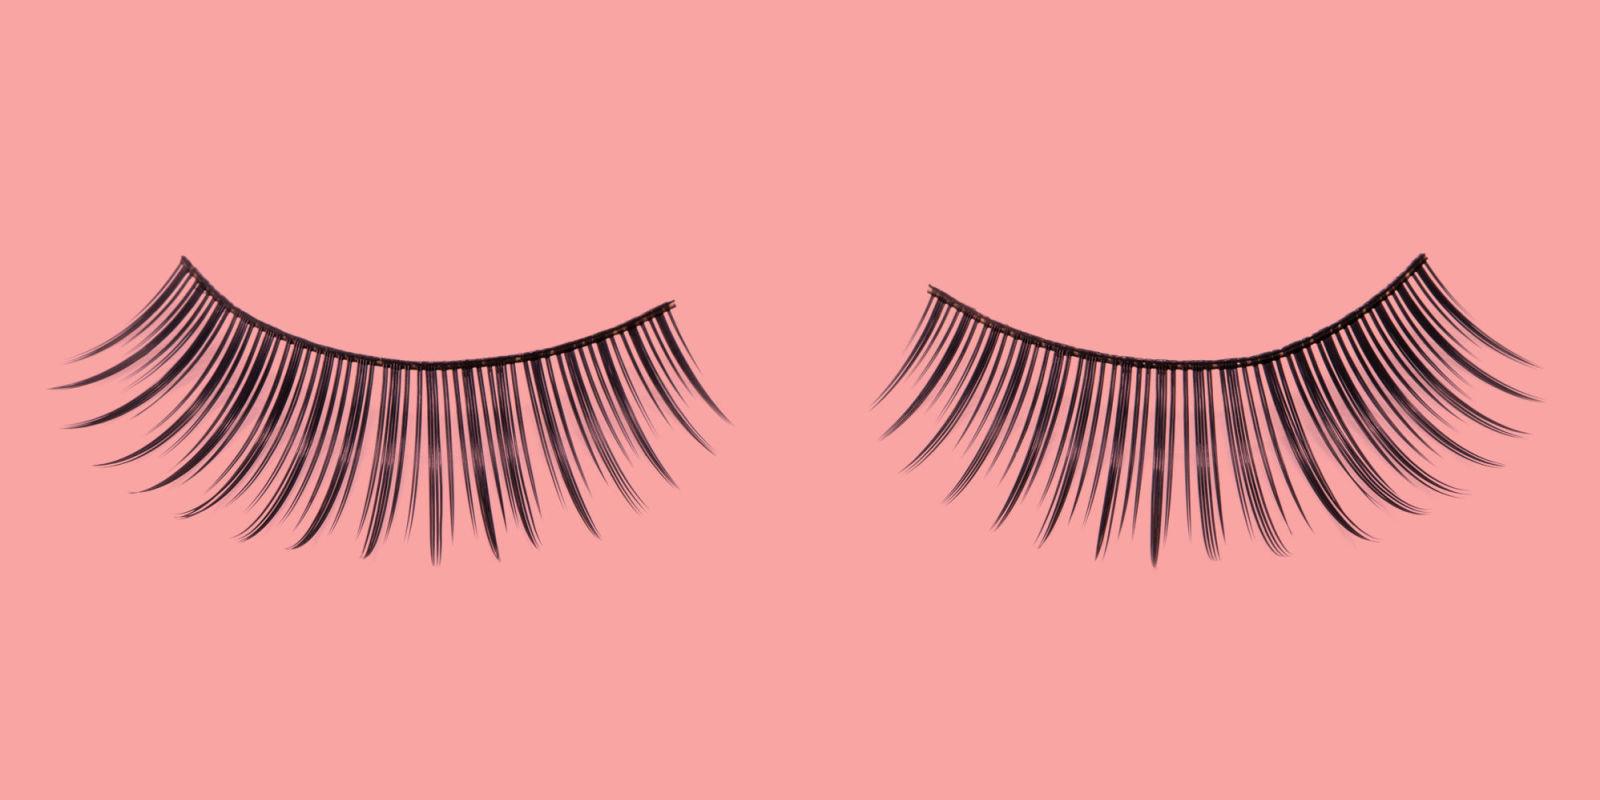 Fake Eyelashes - How to Apply Fake Eyelashes Step by Step